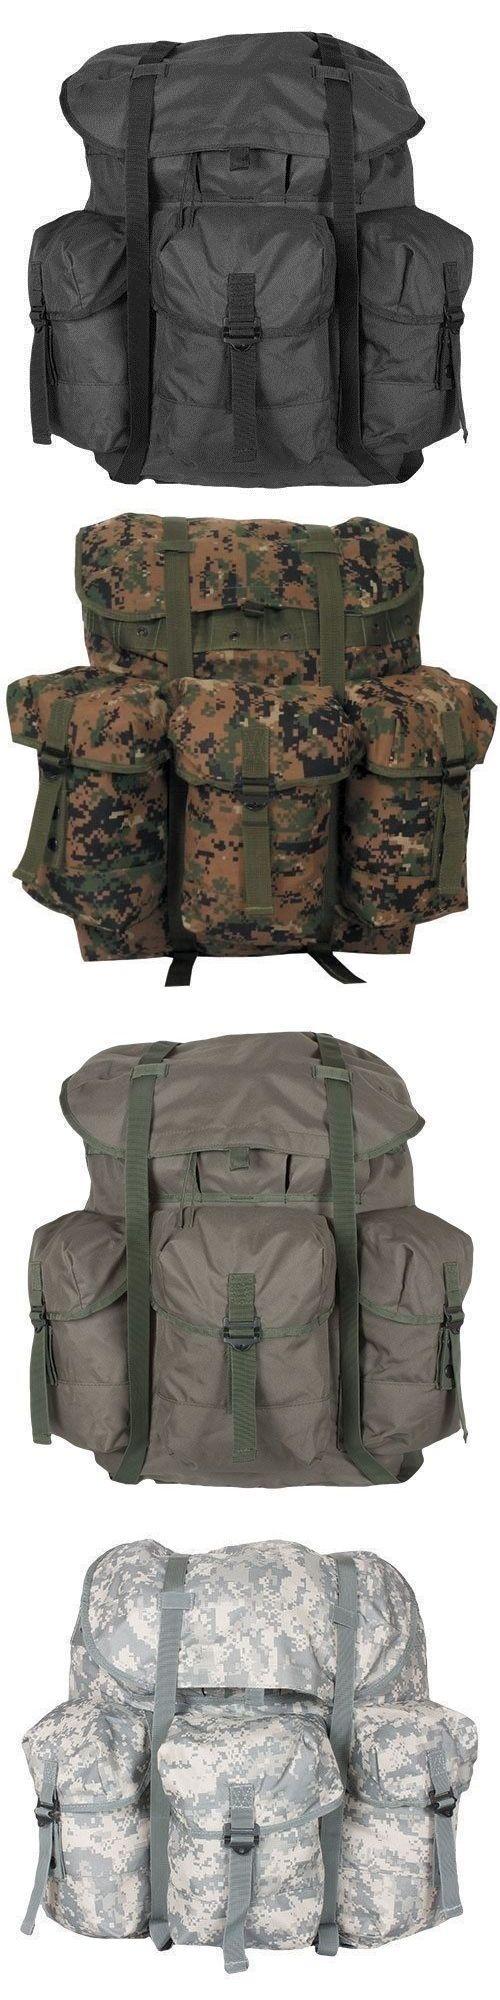 Backpacks alice pack large military field ruck sack ue buy